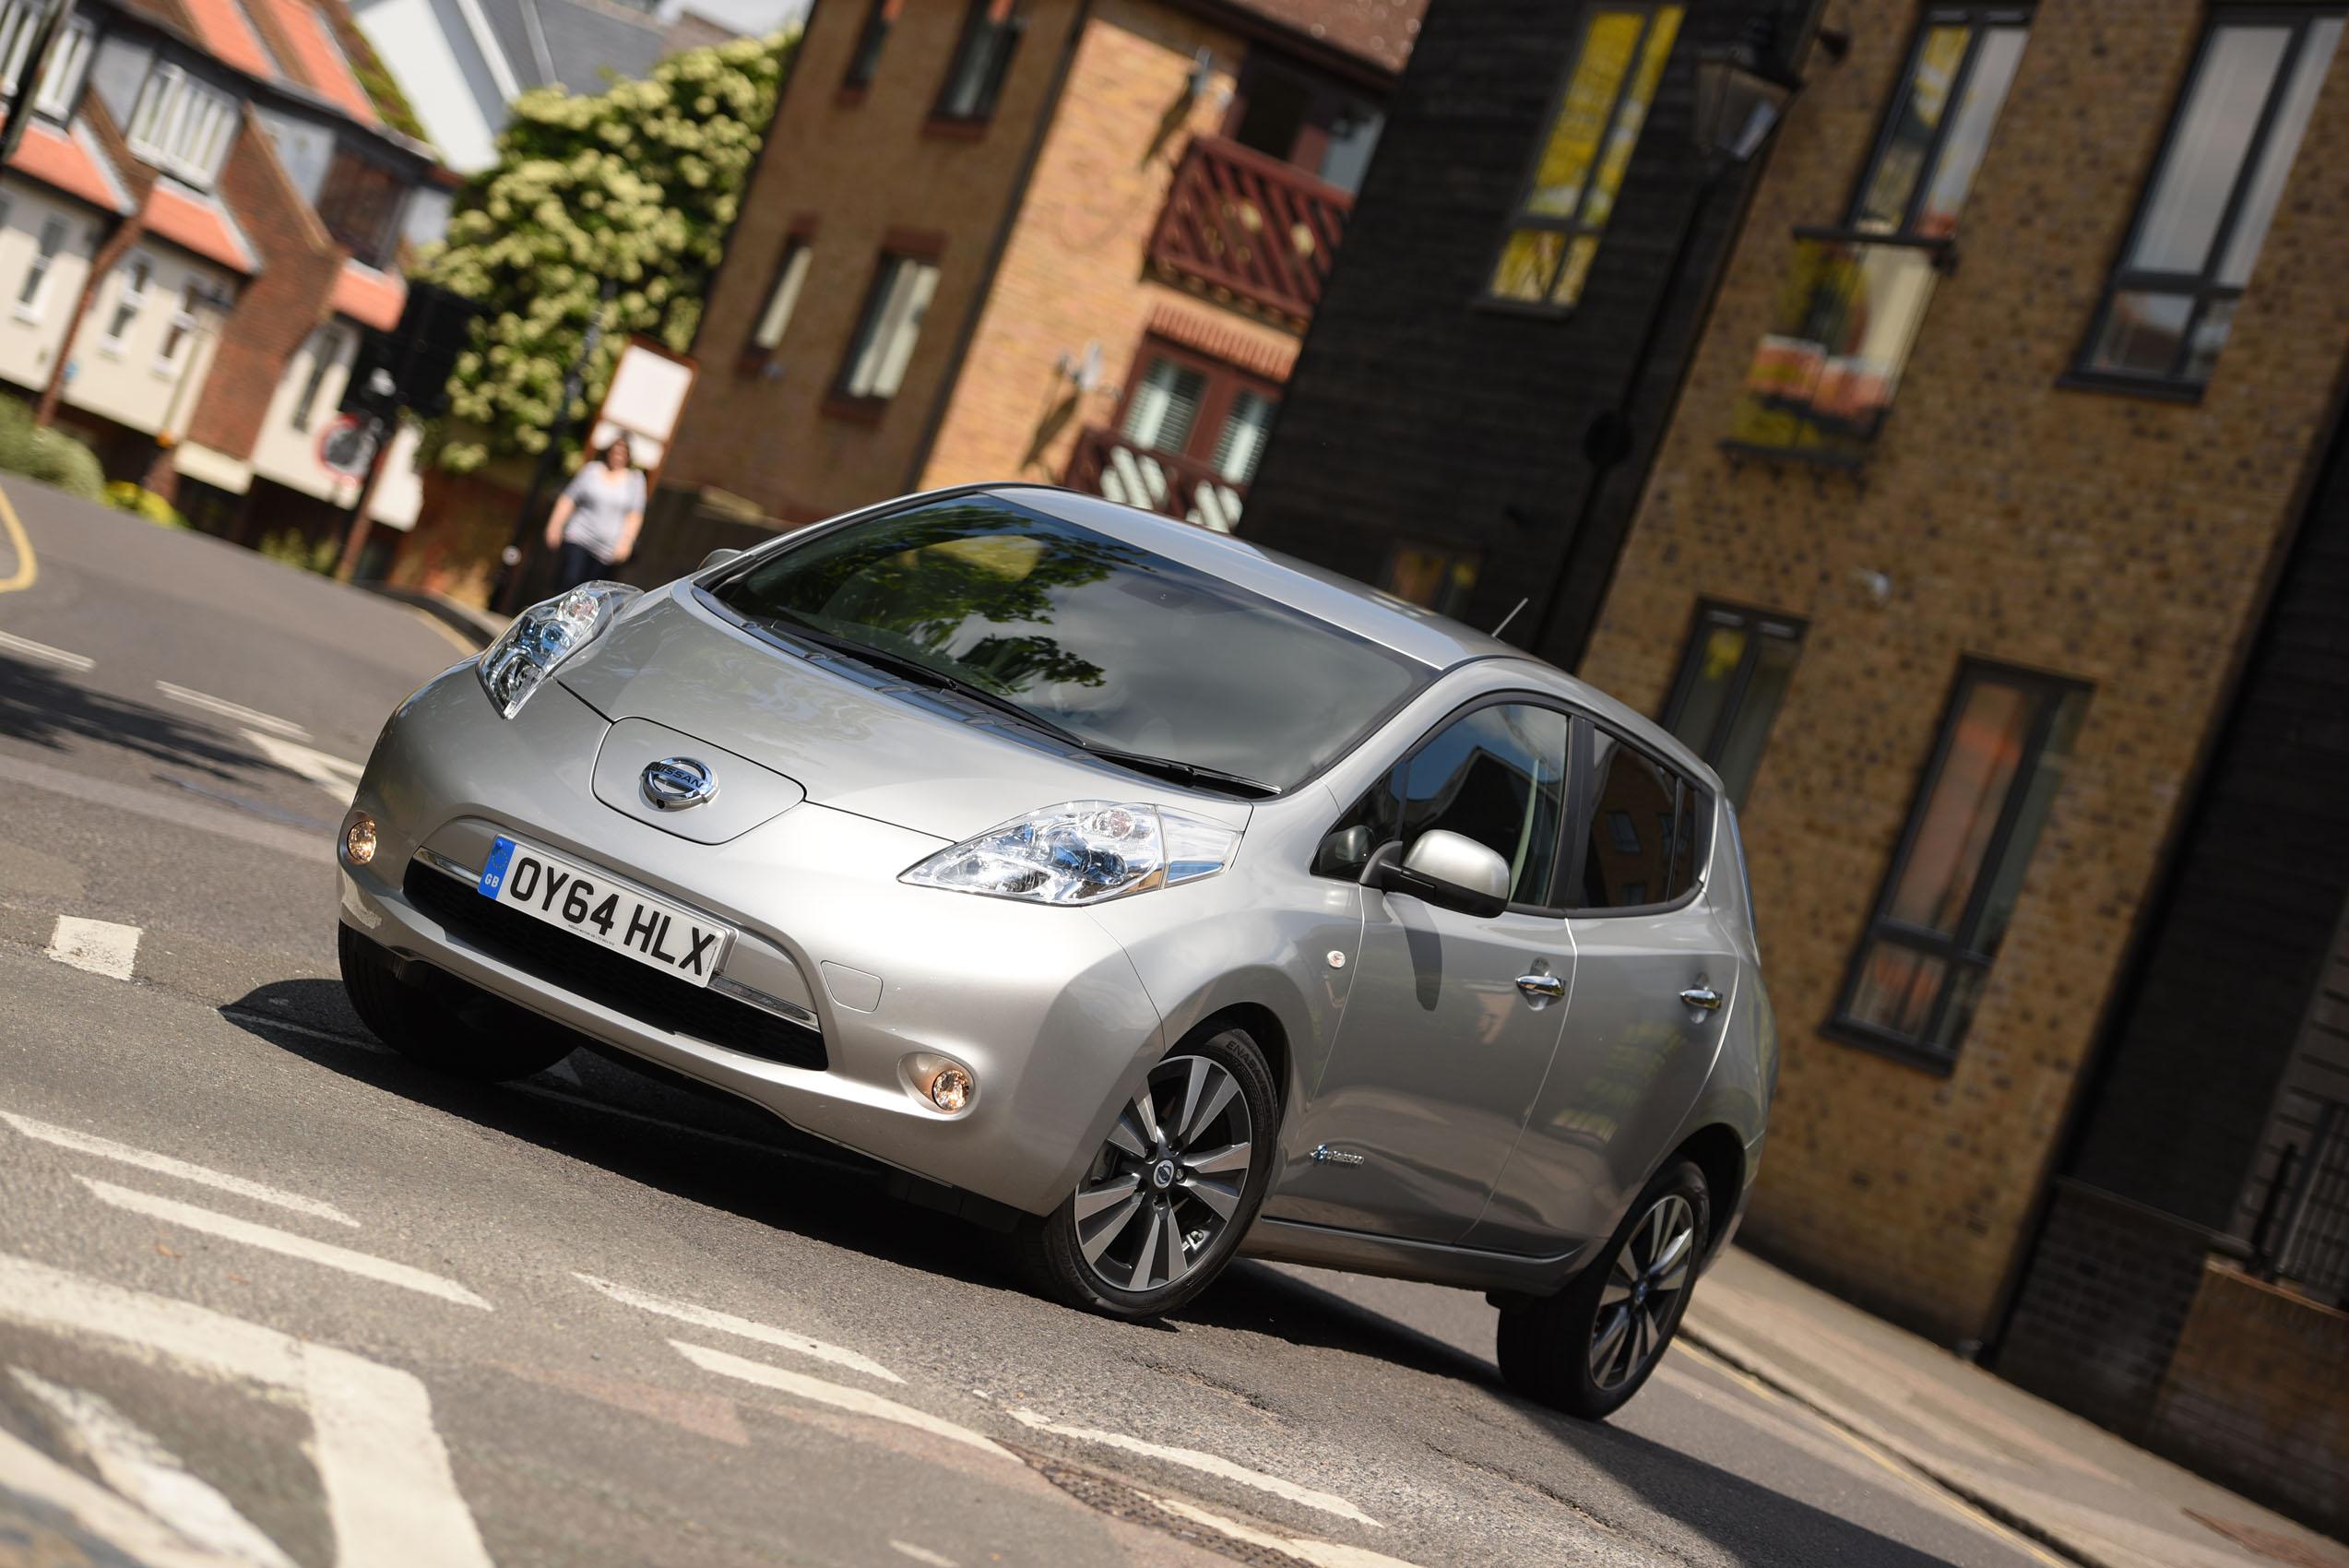 original car review photo s leaf fifth reviews nissan electric test place